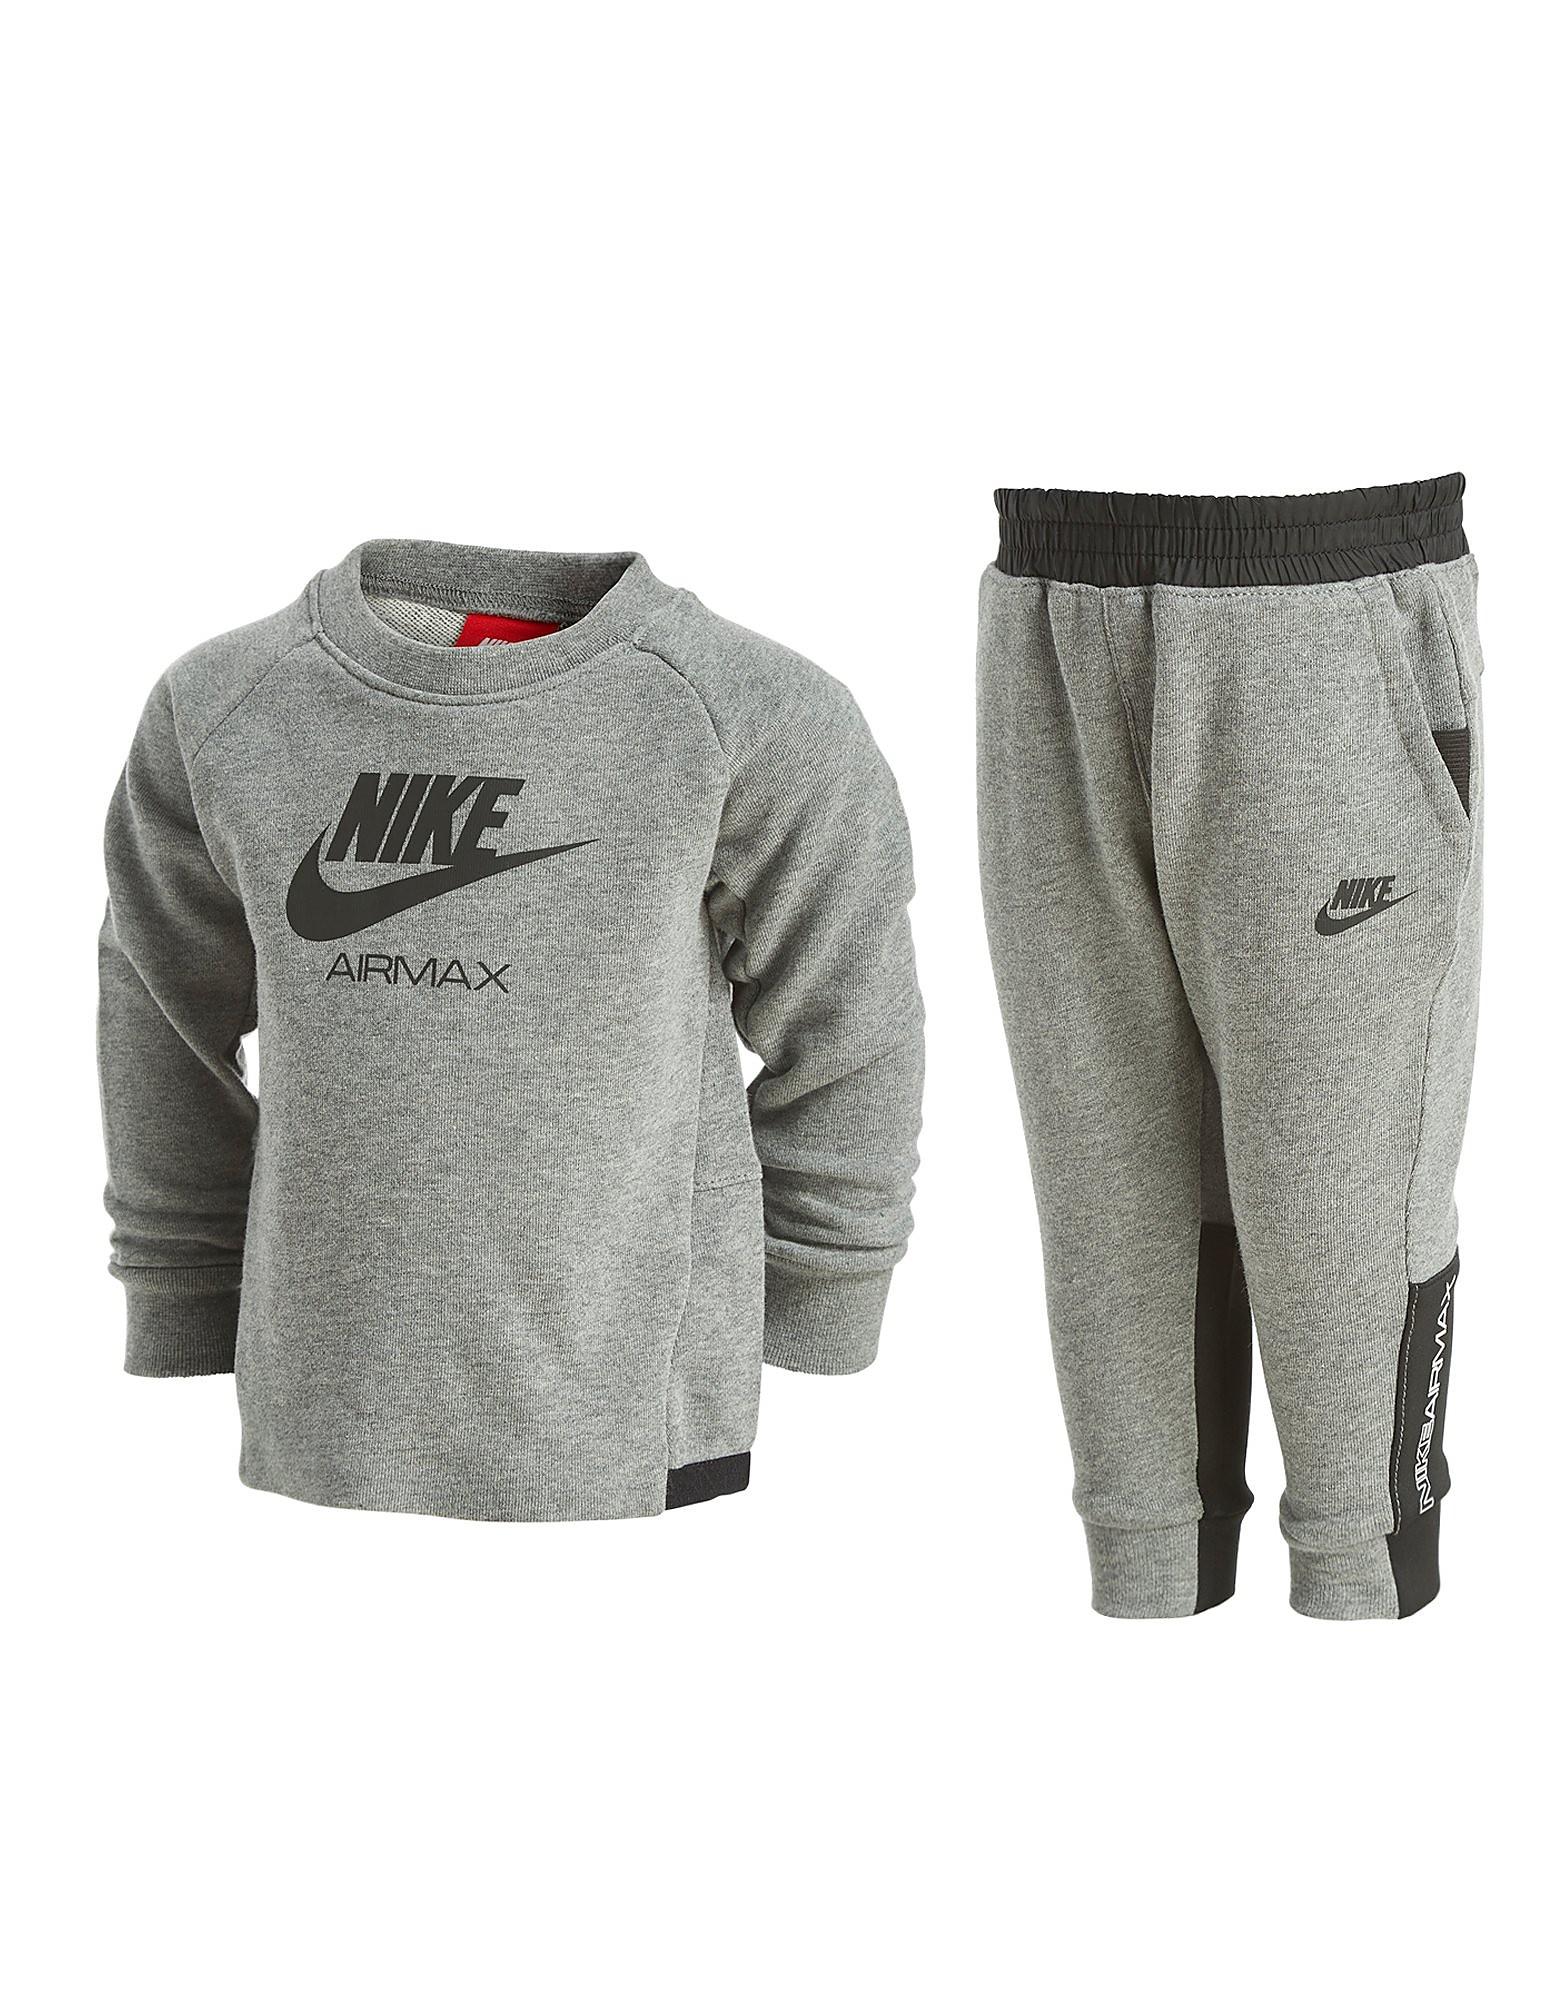 Nike Air Max Crew Suit Infant